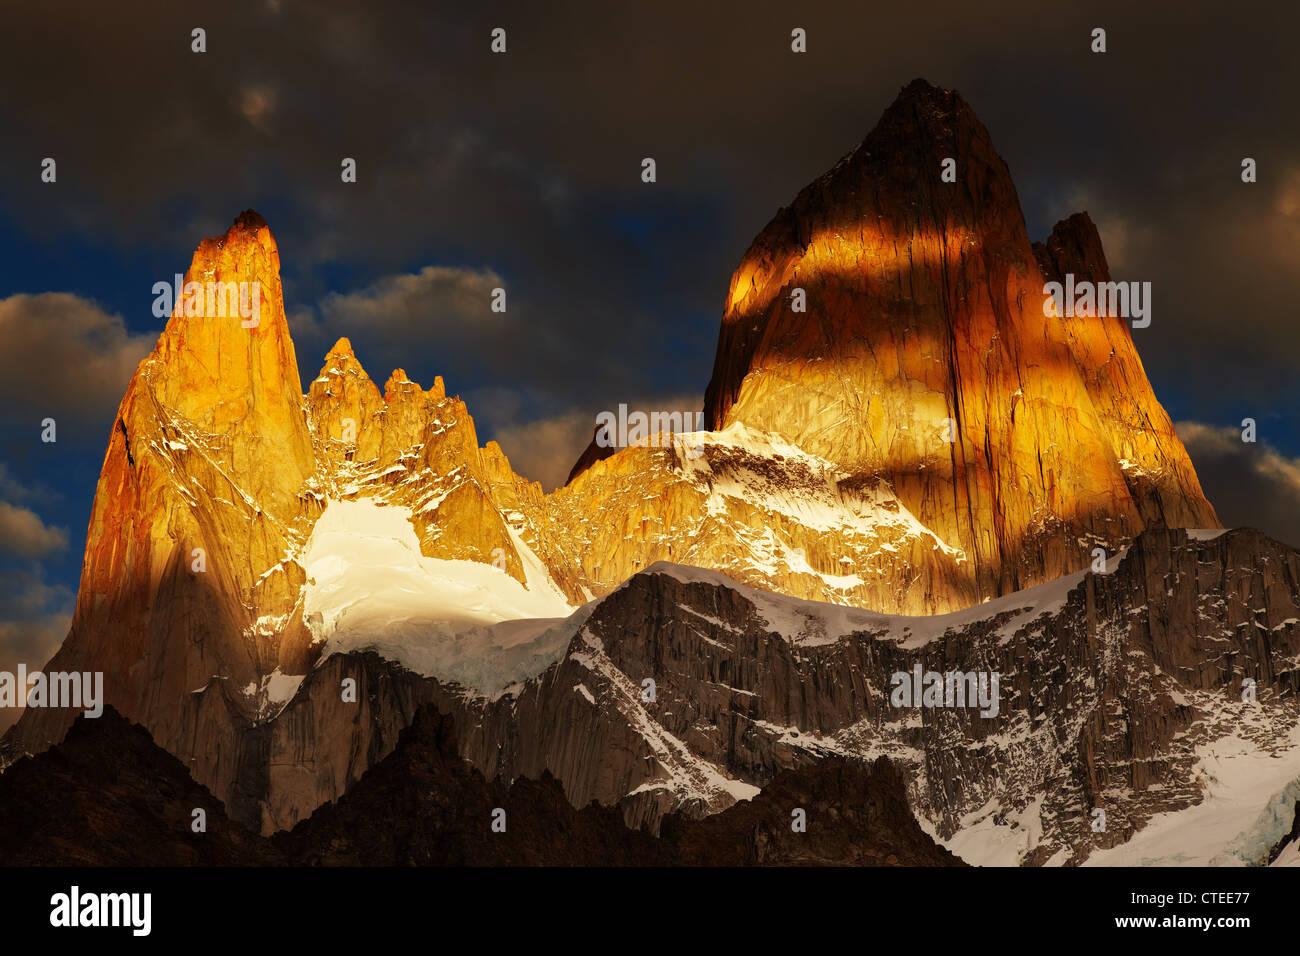 Le mont Fitz Roy, sunrise dramatiques, Patagonie, Argentine Photo Stock